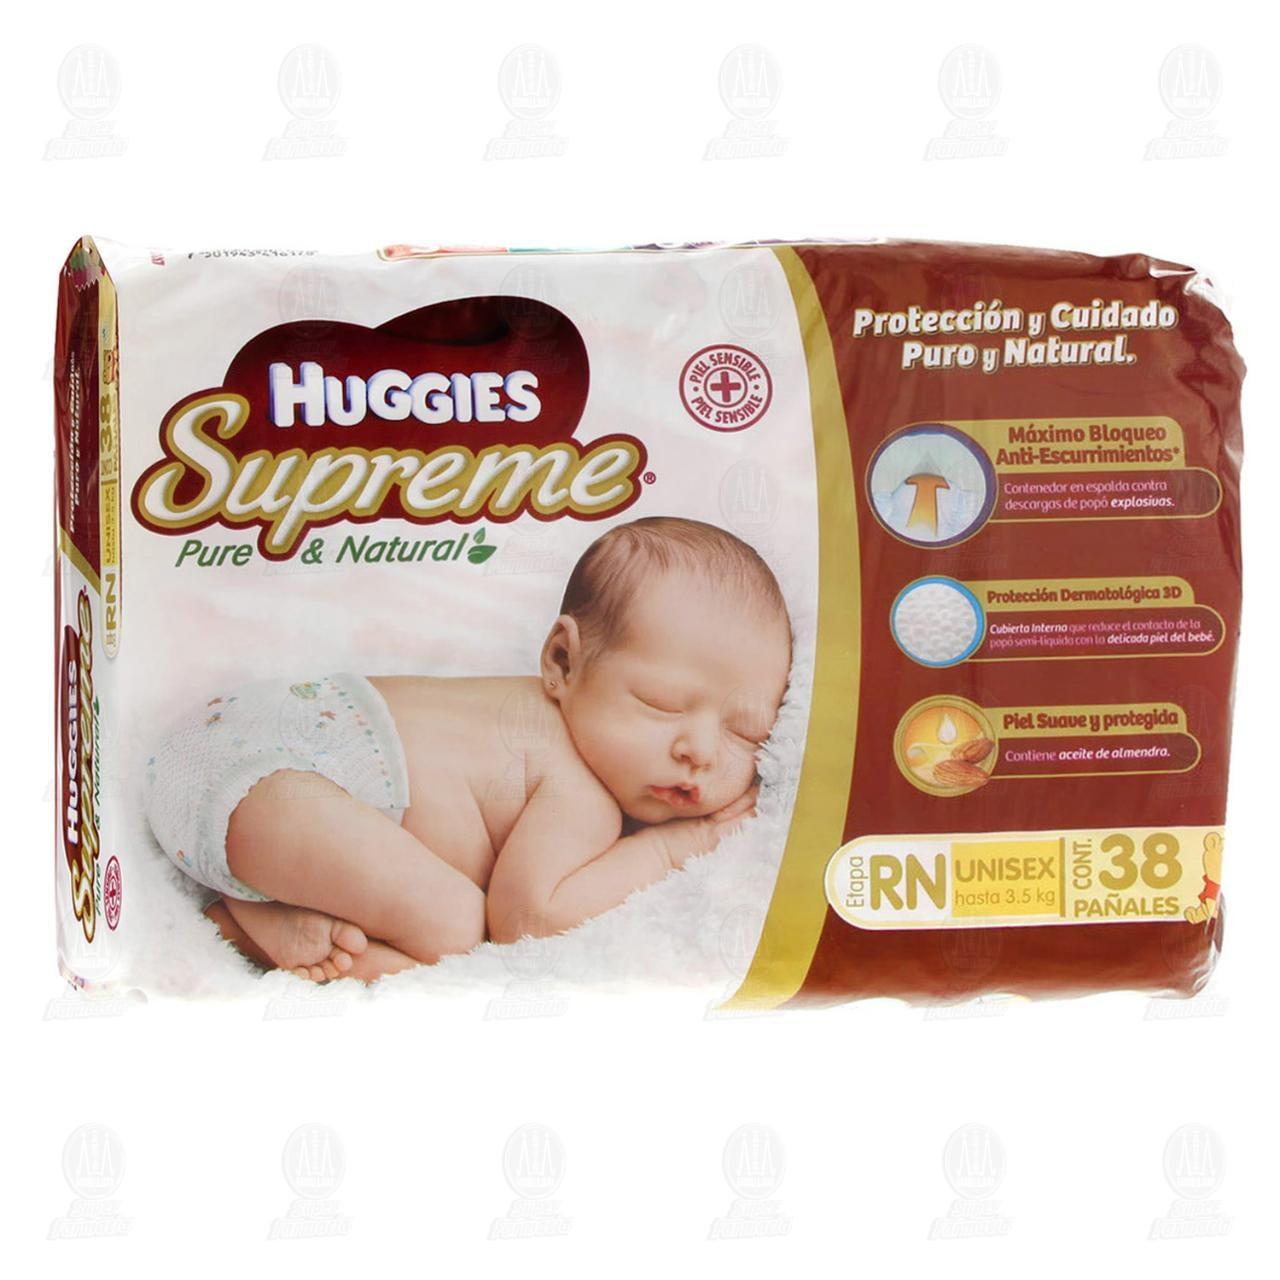 Comprar Pañales para Bebé Huggies Supreme Pure & Natural Unisex Etapa RN, 38 pzas. en Farmacias Guadalajara